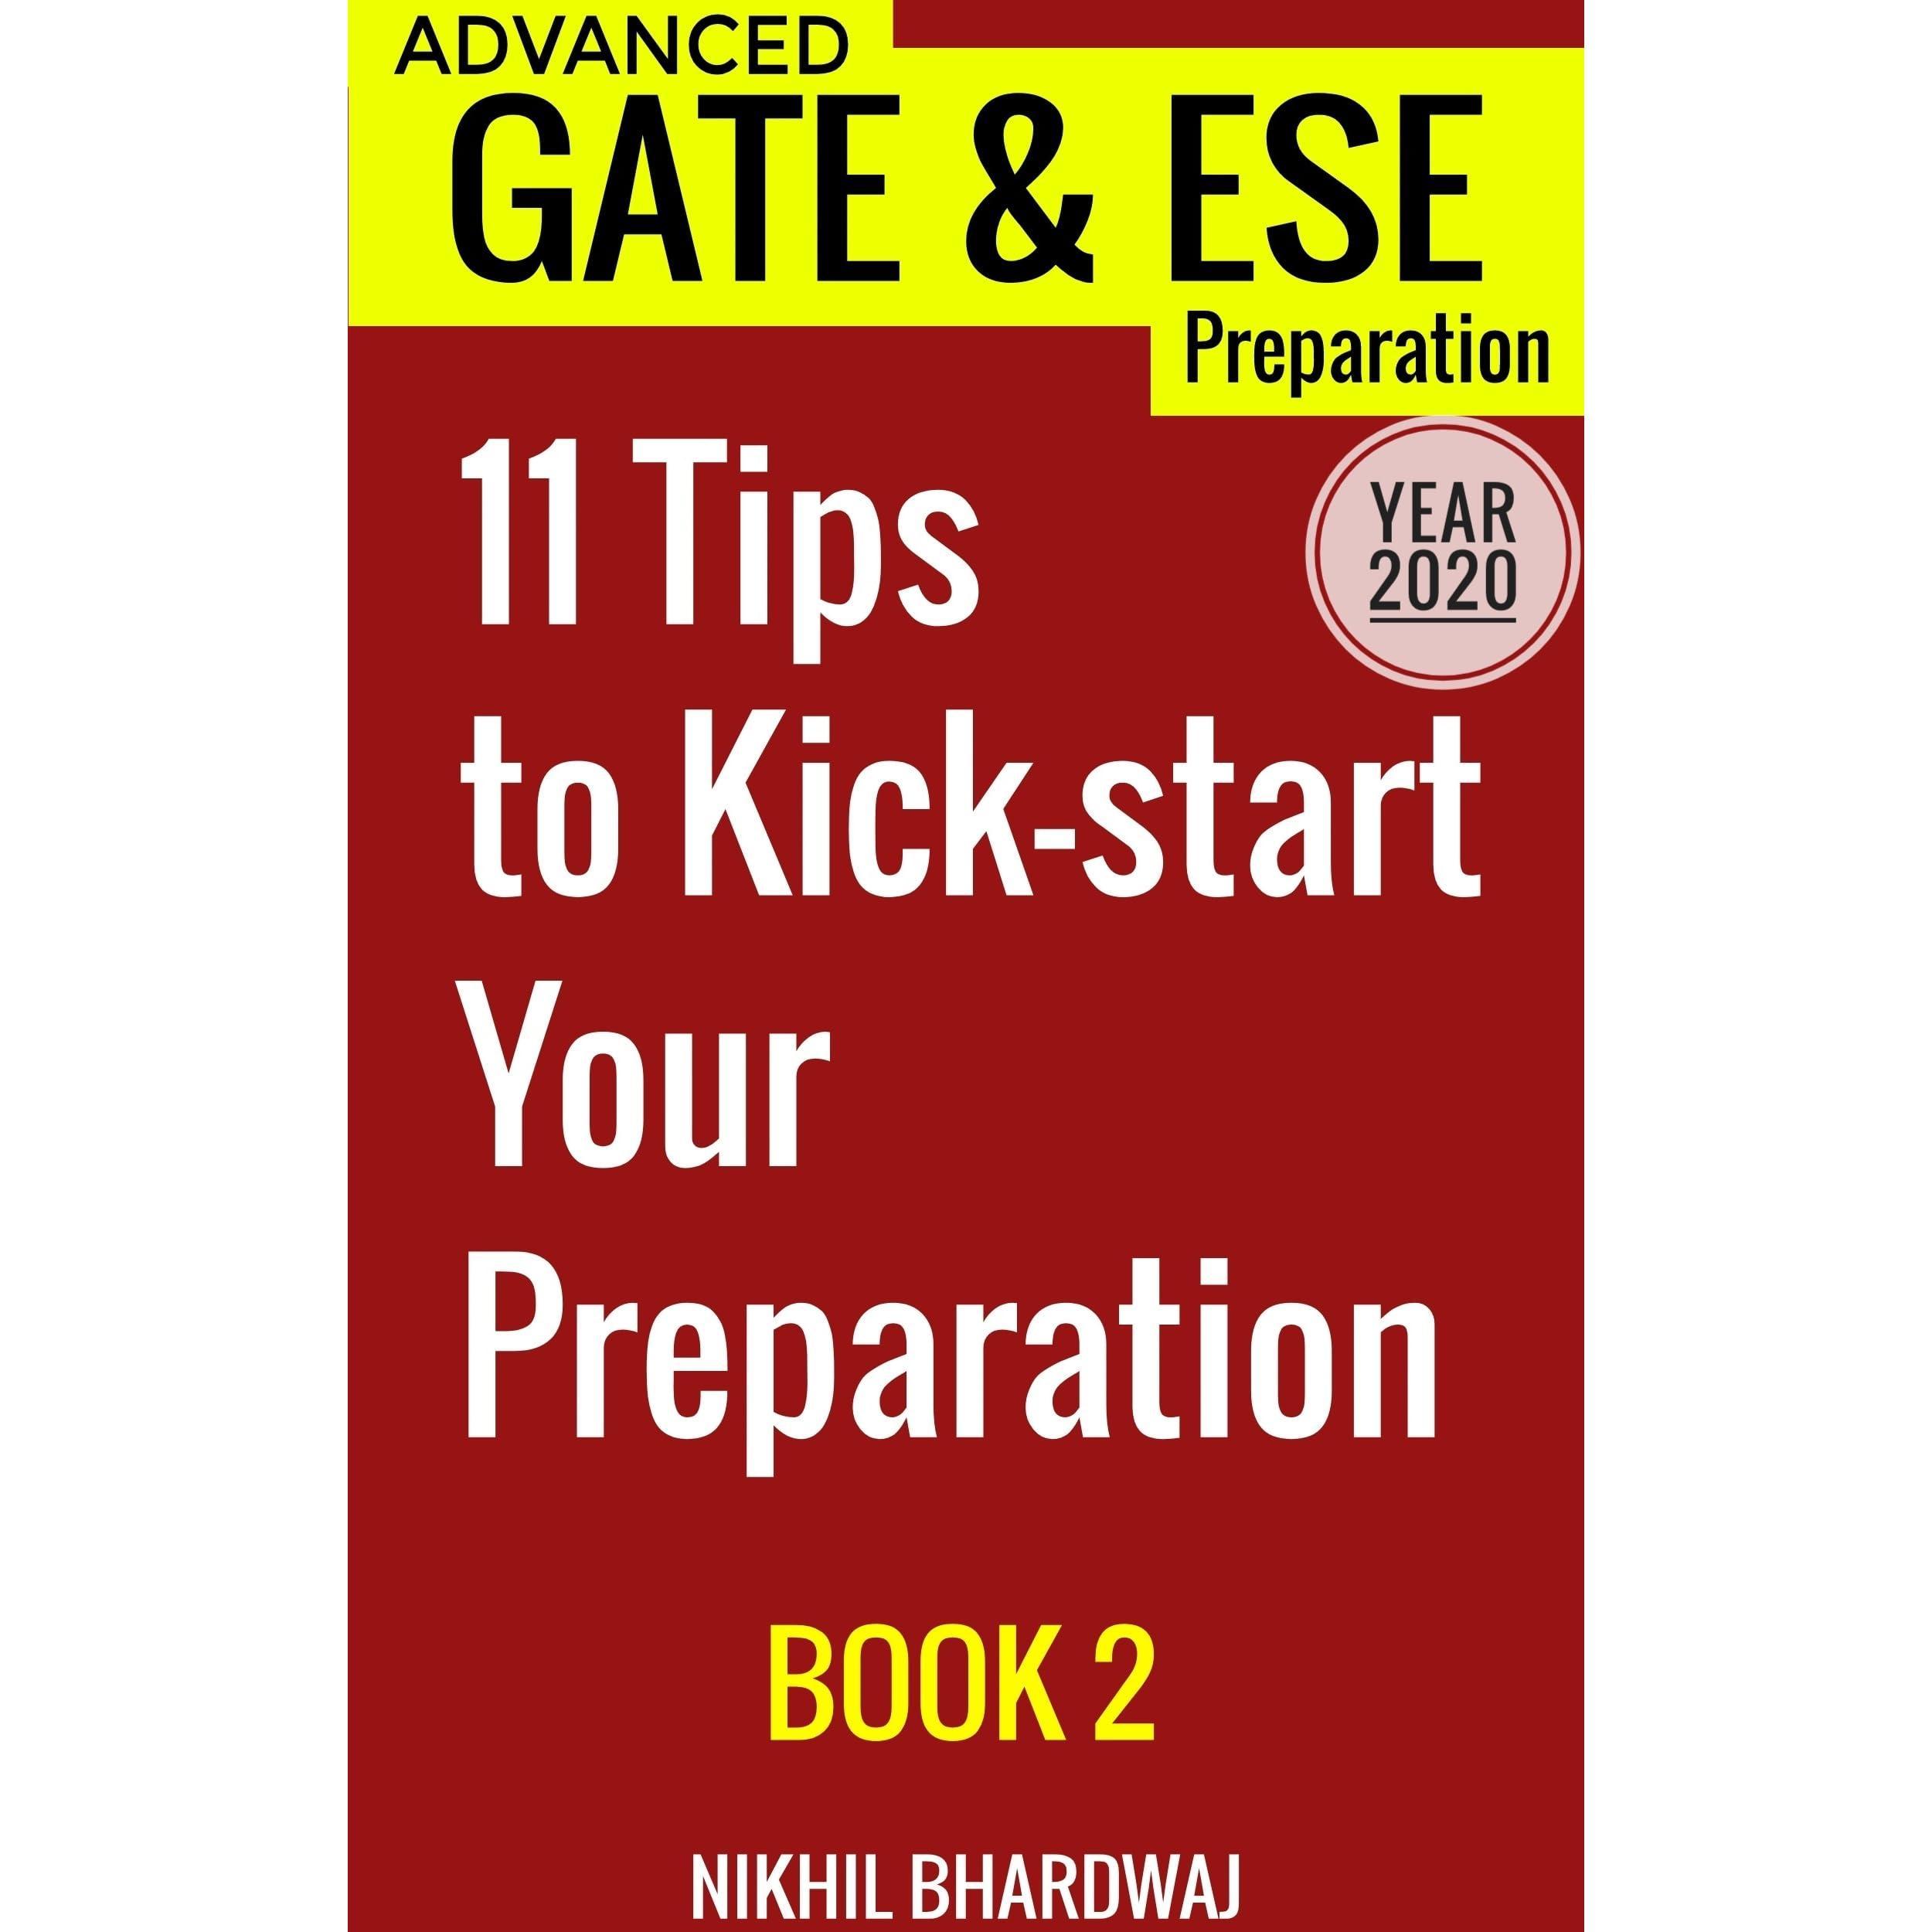 Year 2020: Advanced GATE & ESE Preparation Book 2: 11 Tips